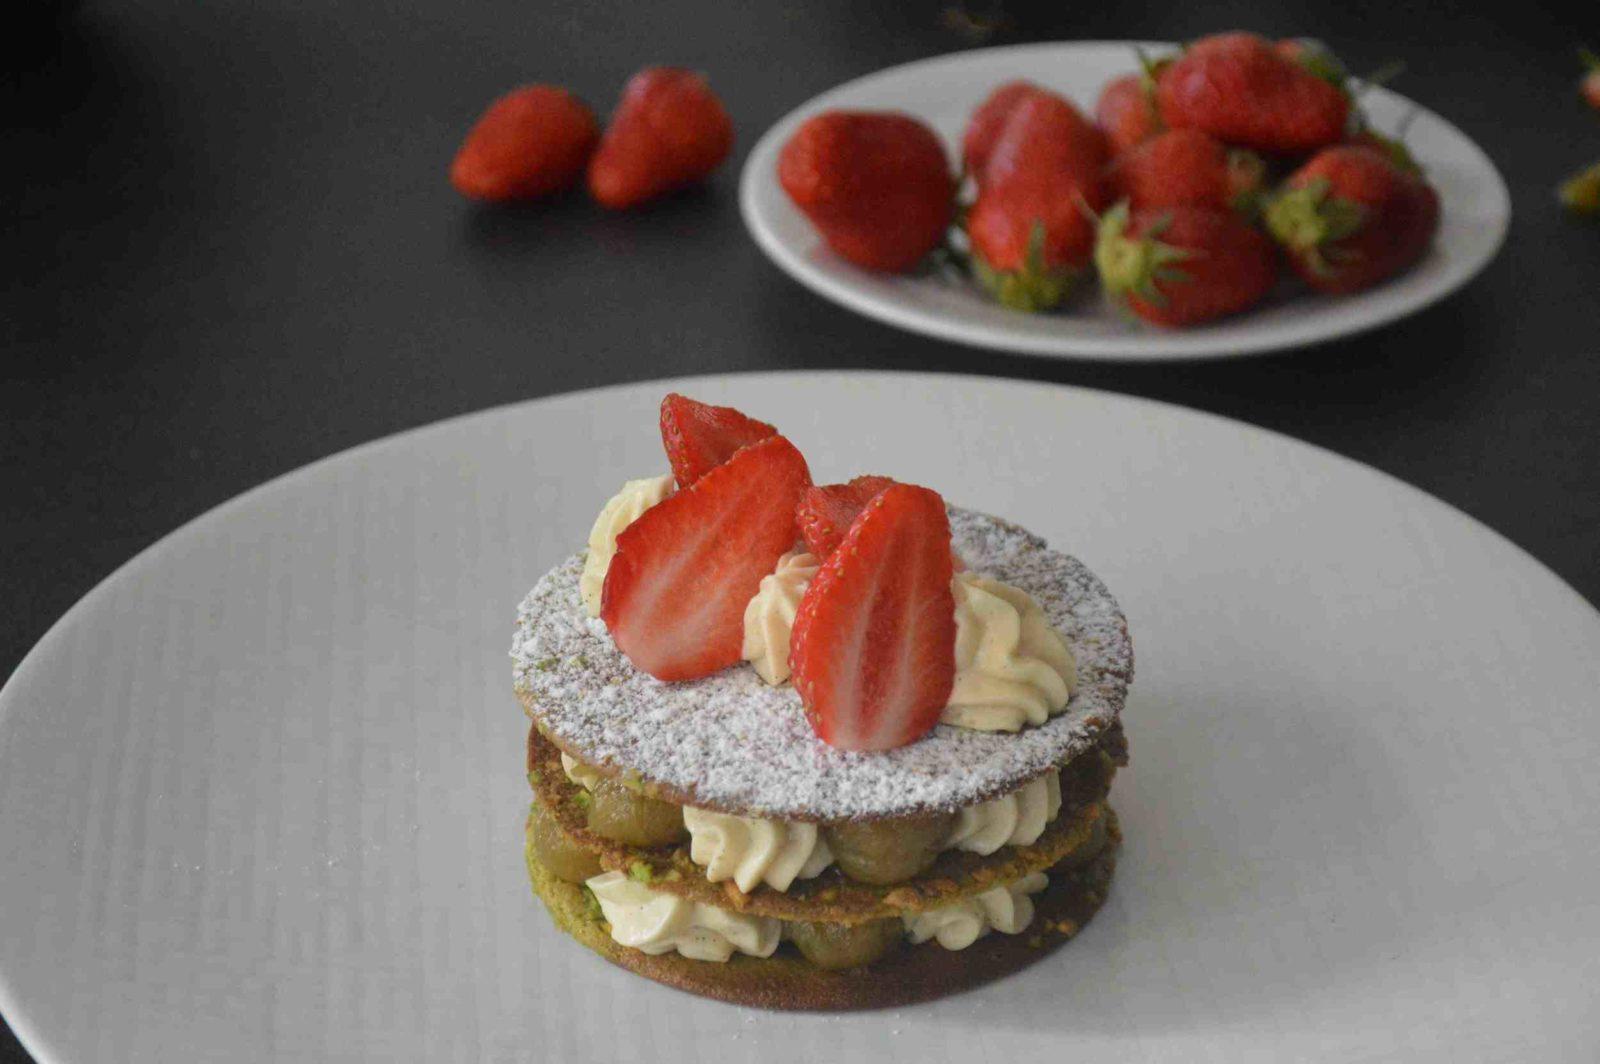 millefeuille+pistache,+rhubarbe,+fraise